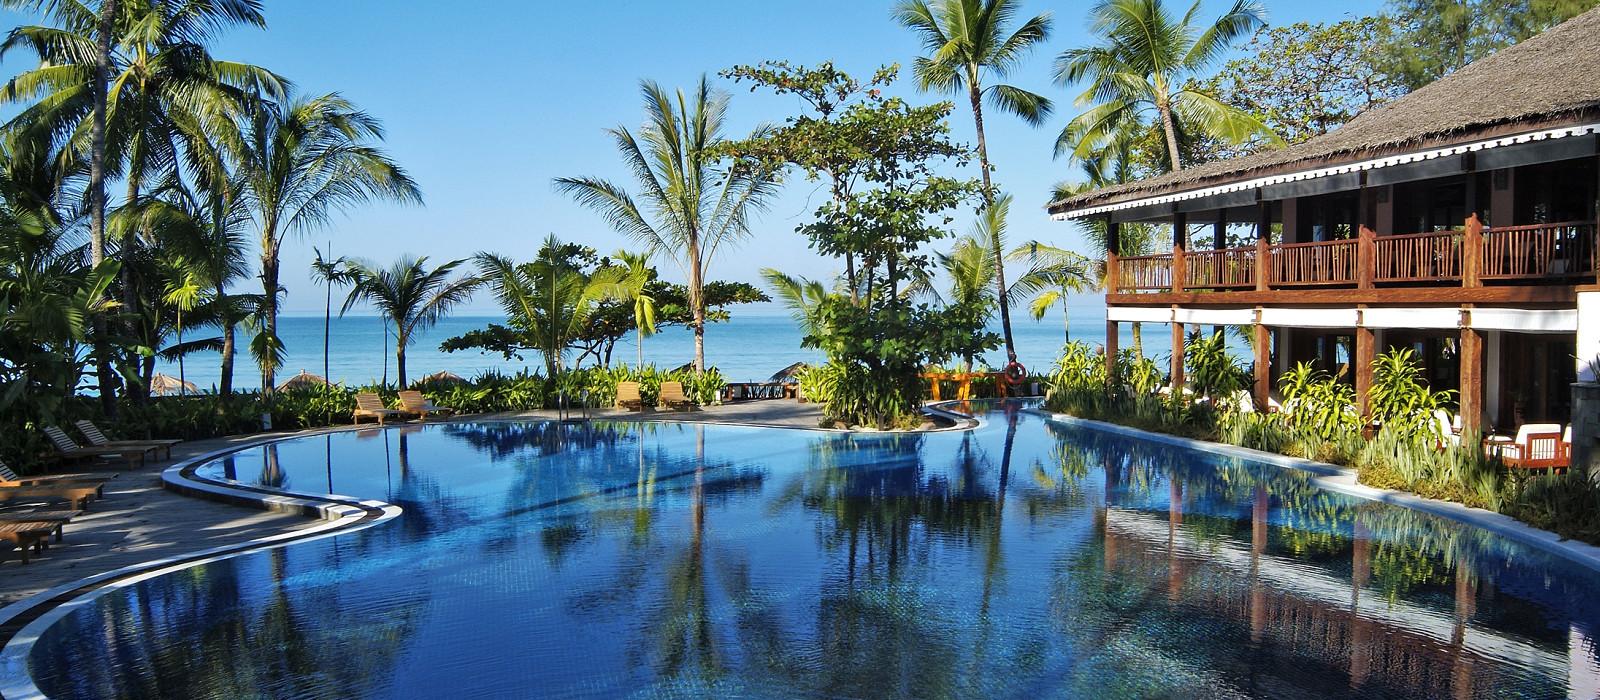 Hotel Sandoway Resort Myanmar